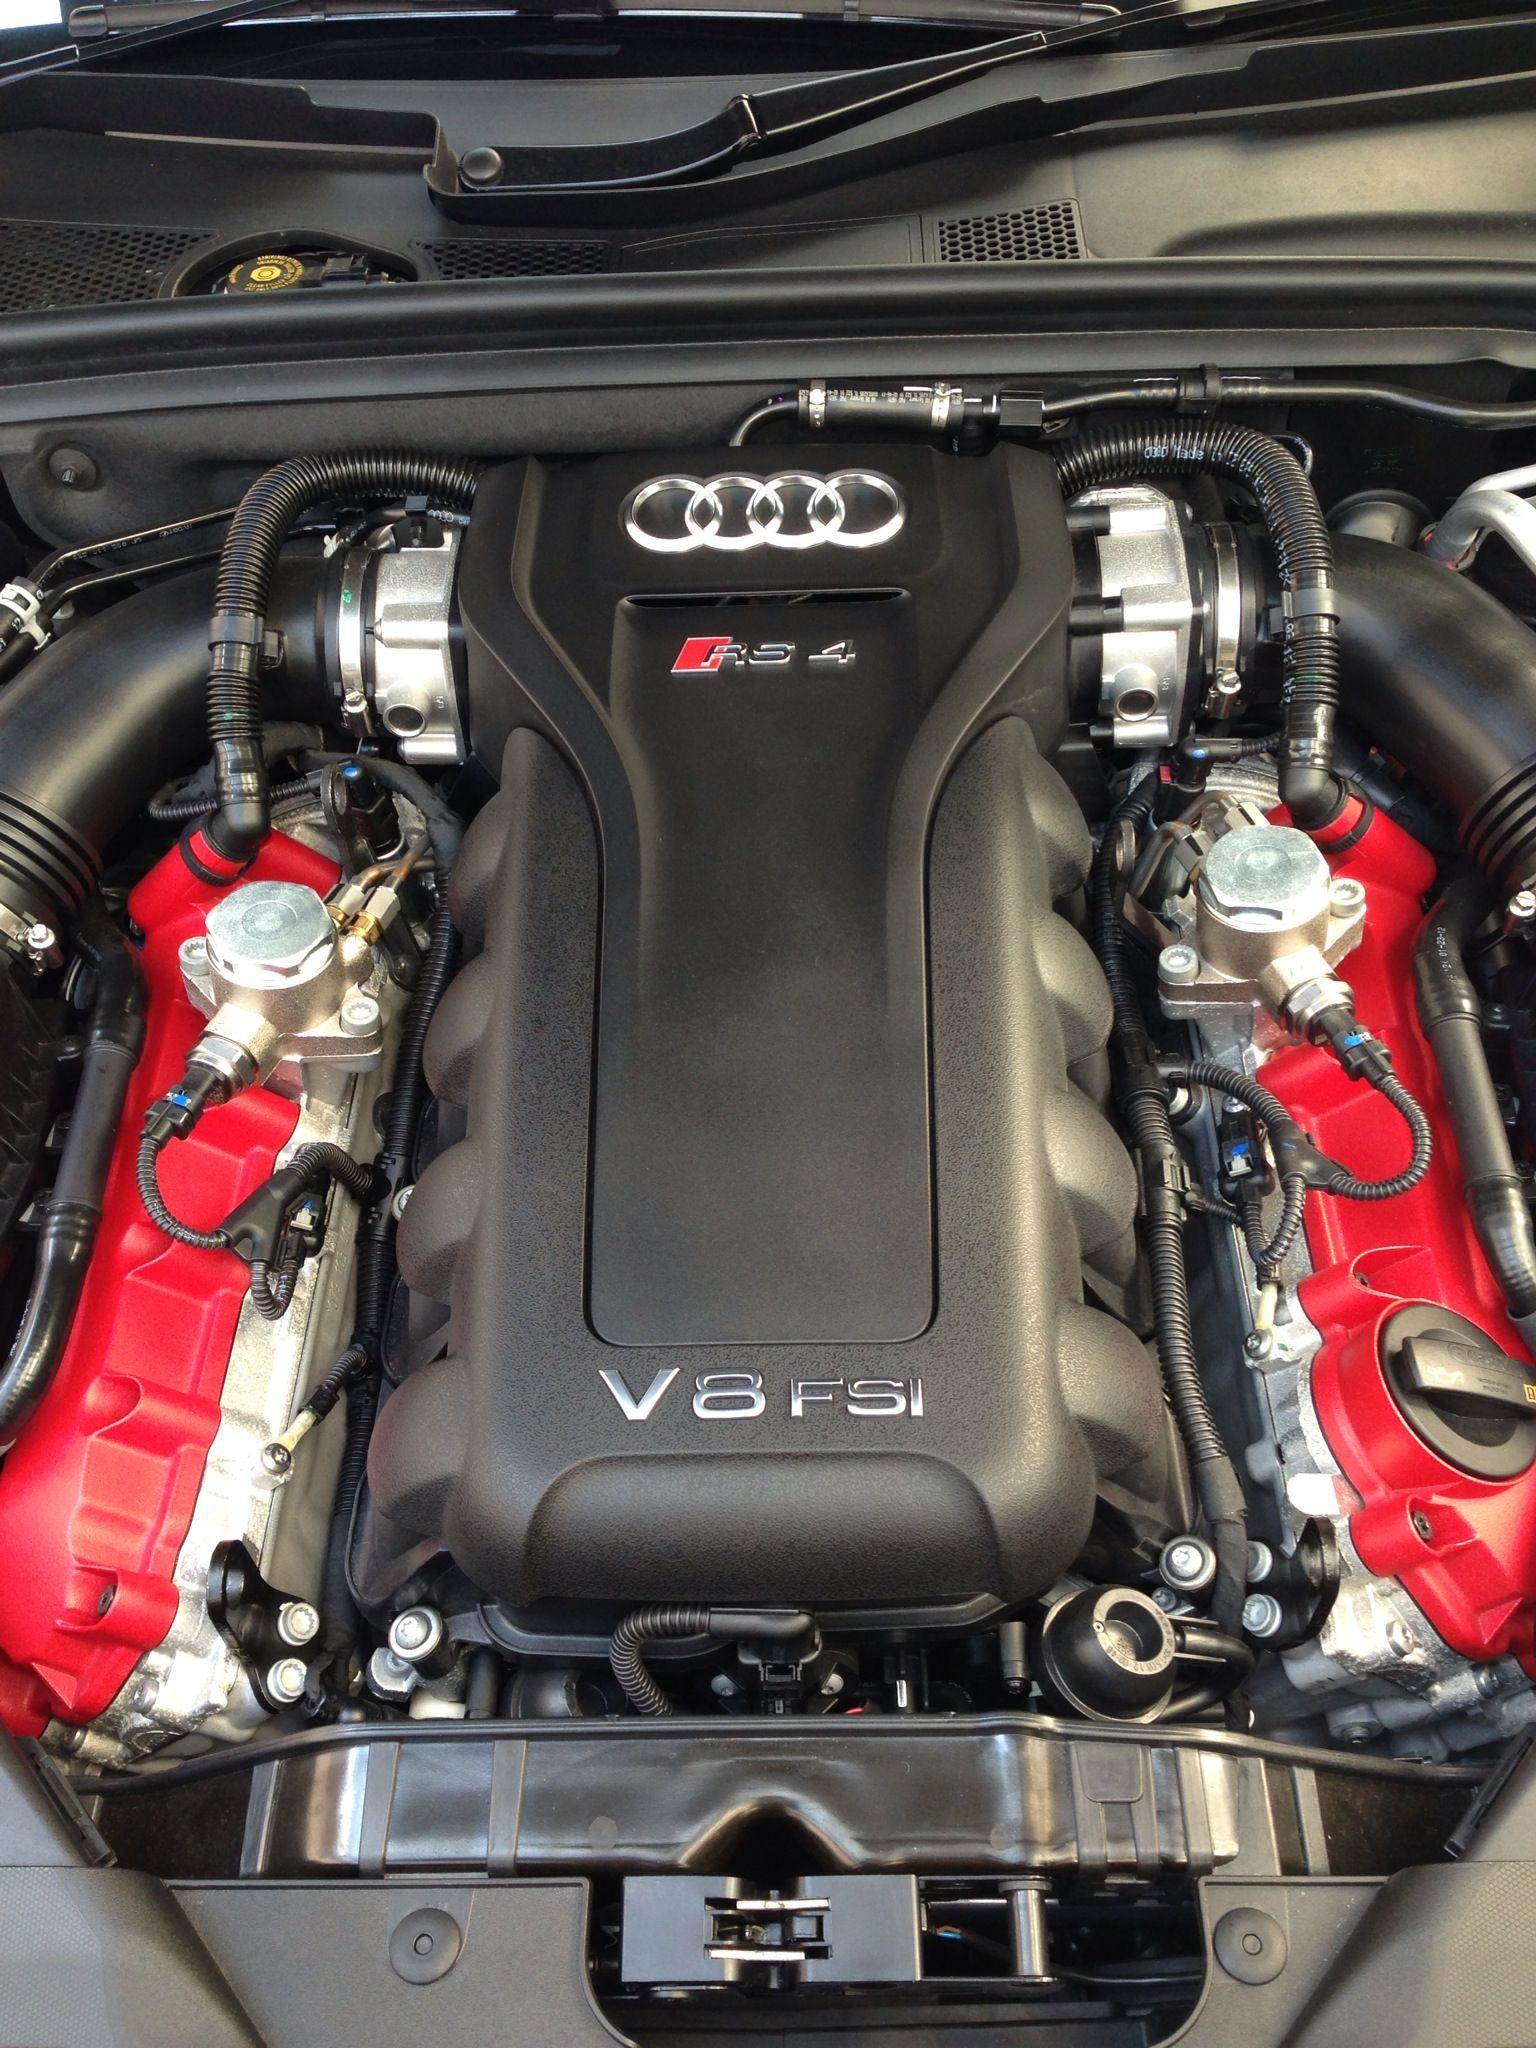 New Audi Rs4 4 2 V8 Engine Audi Motorsport Audi Rs4 Audi Cars